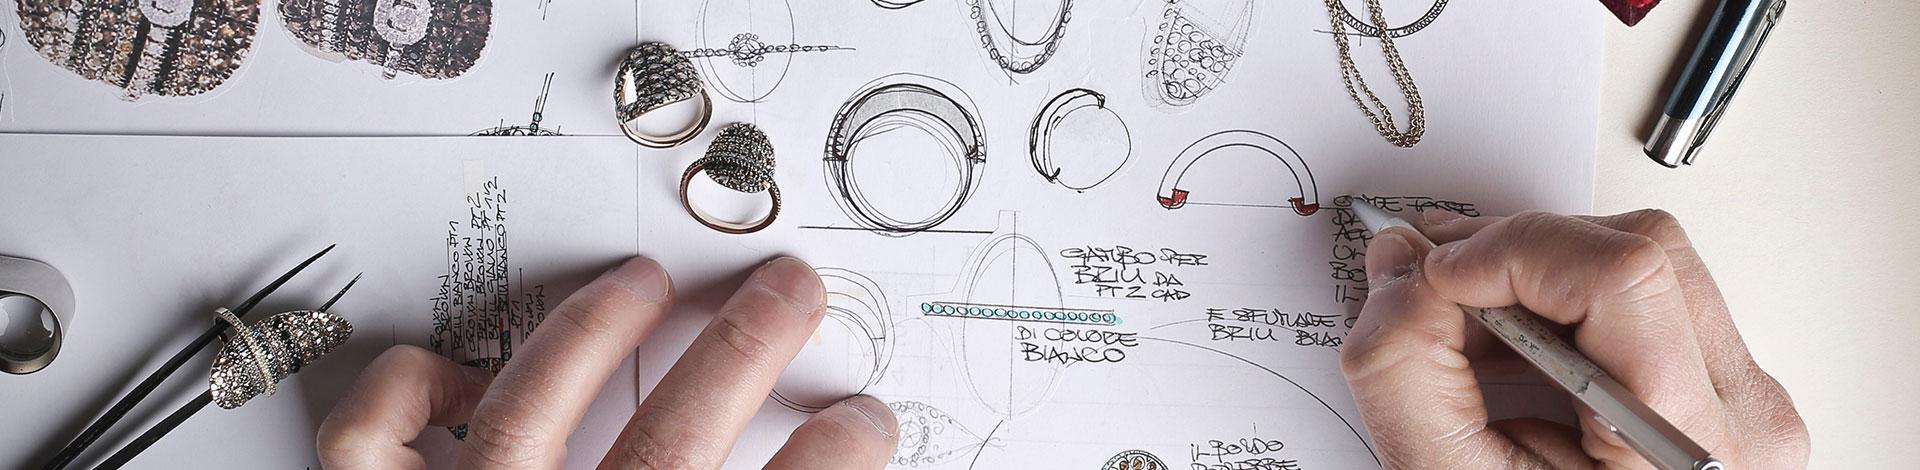 Custom made jewelry | Gold & diamonds | Premium quality Zazare Diamonds